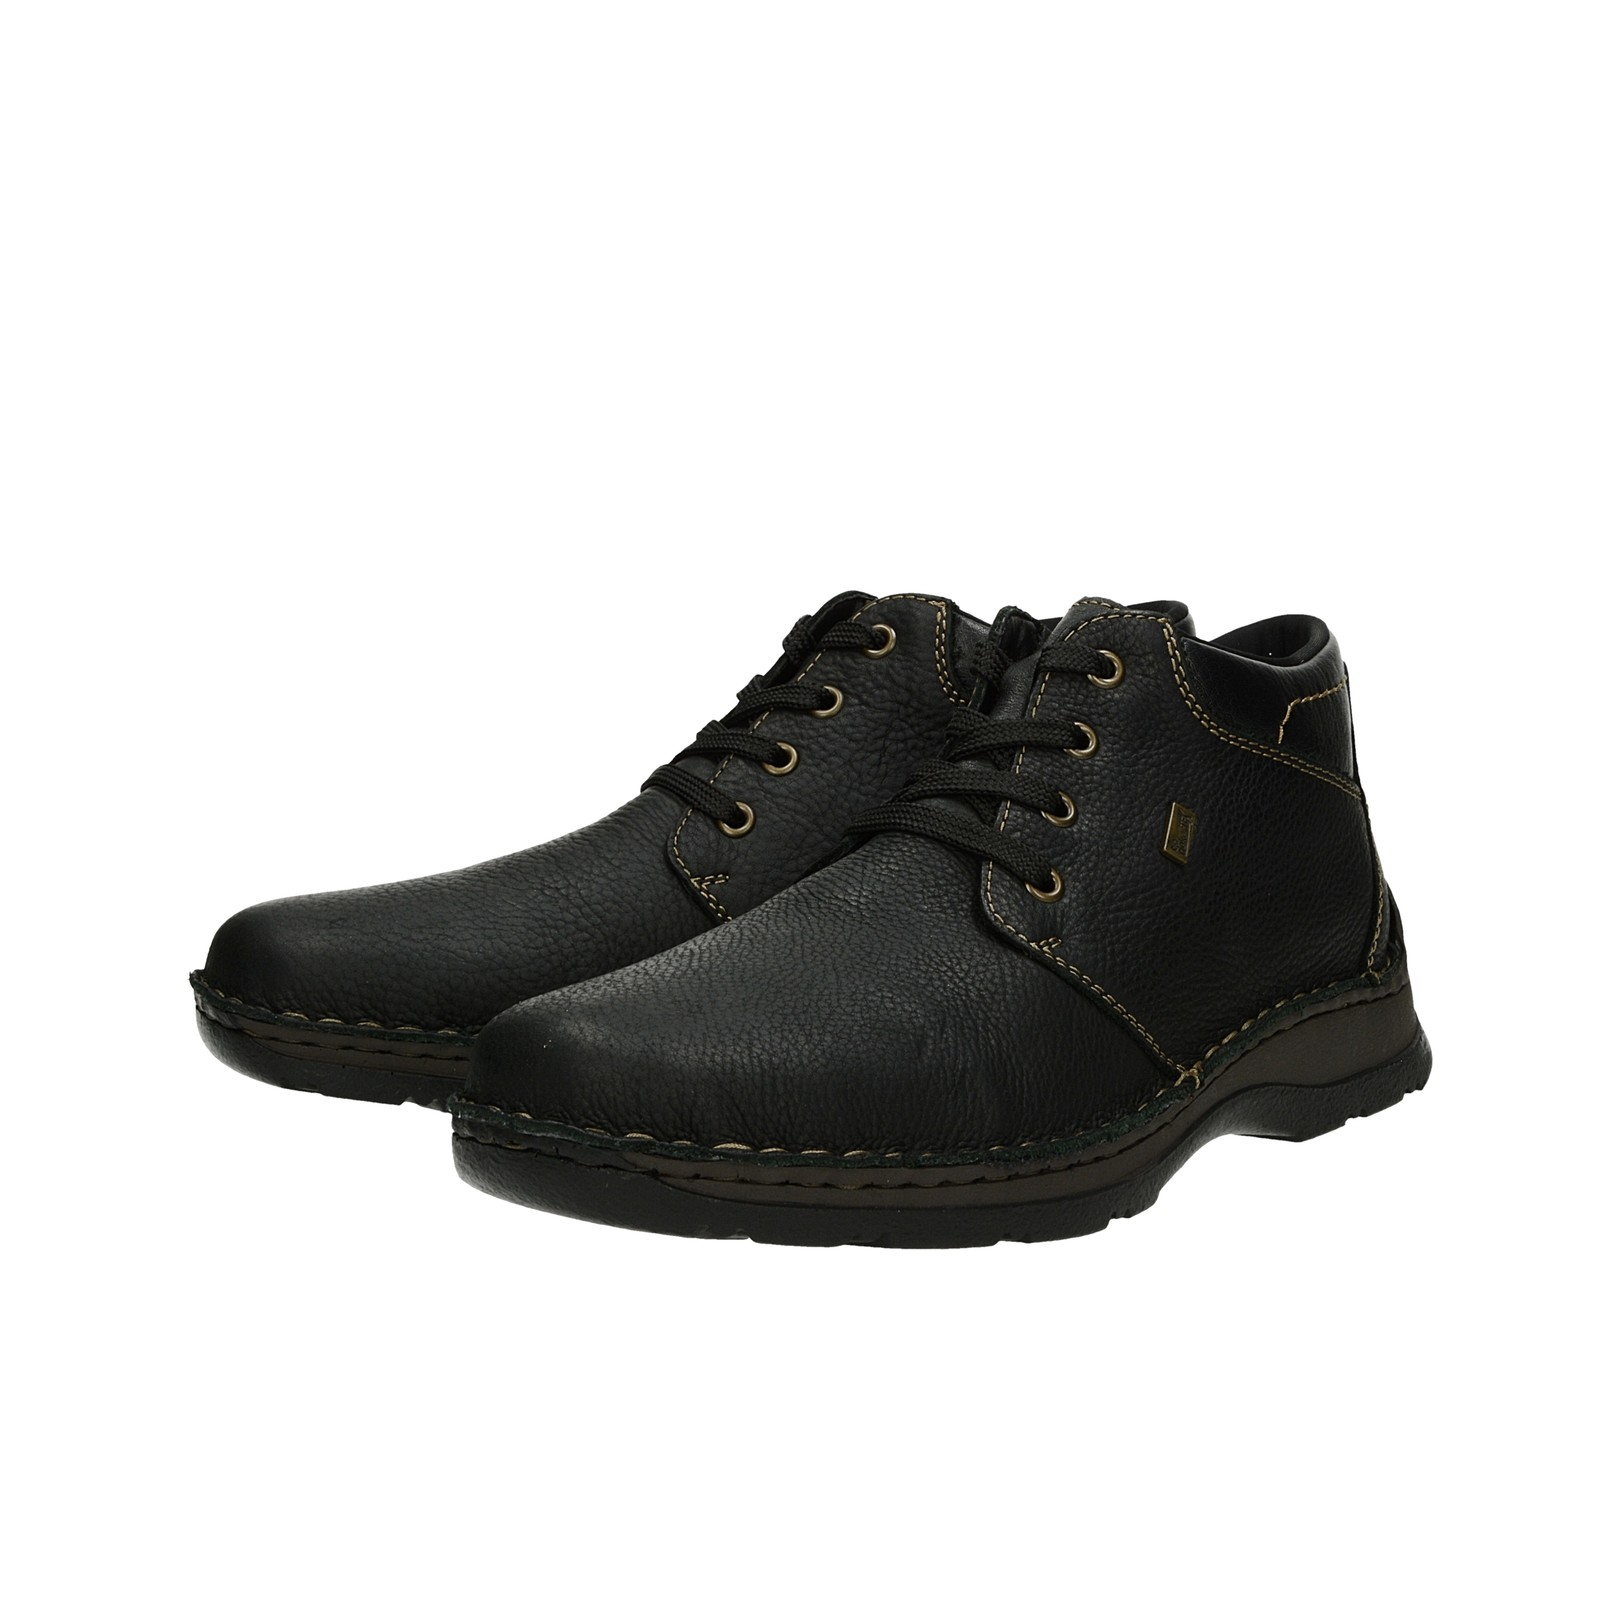 b222b10fd Rieker pánske zimné topánky - čierne | 530500-BLK www.robel.sk